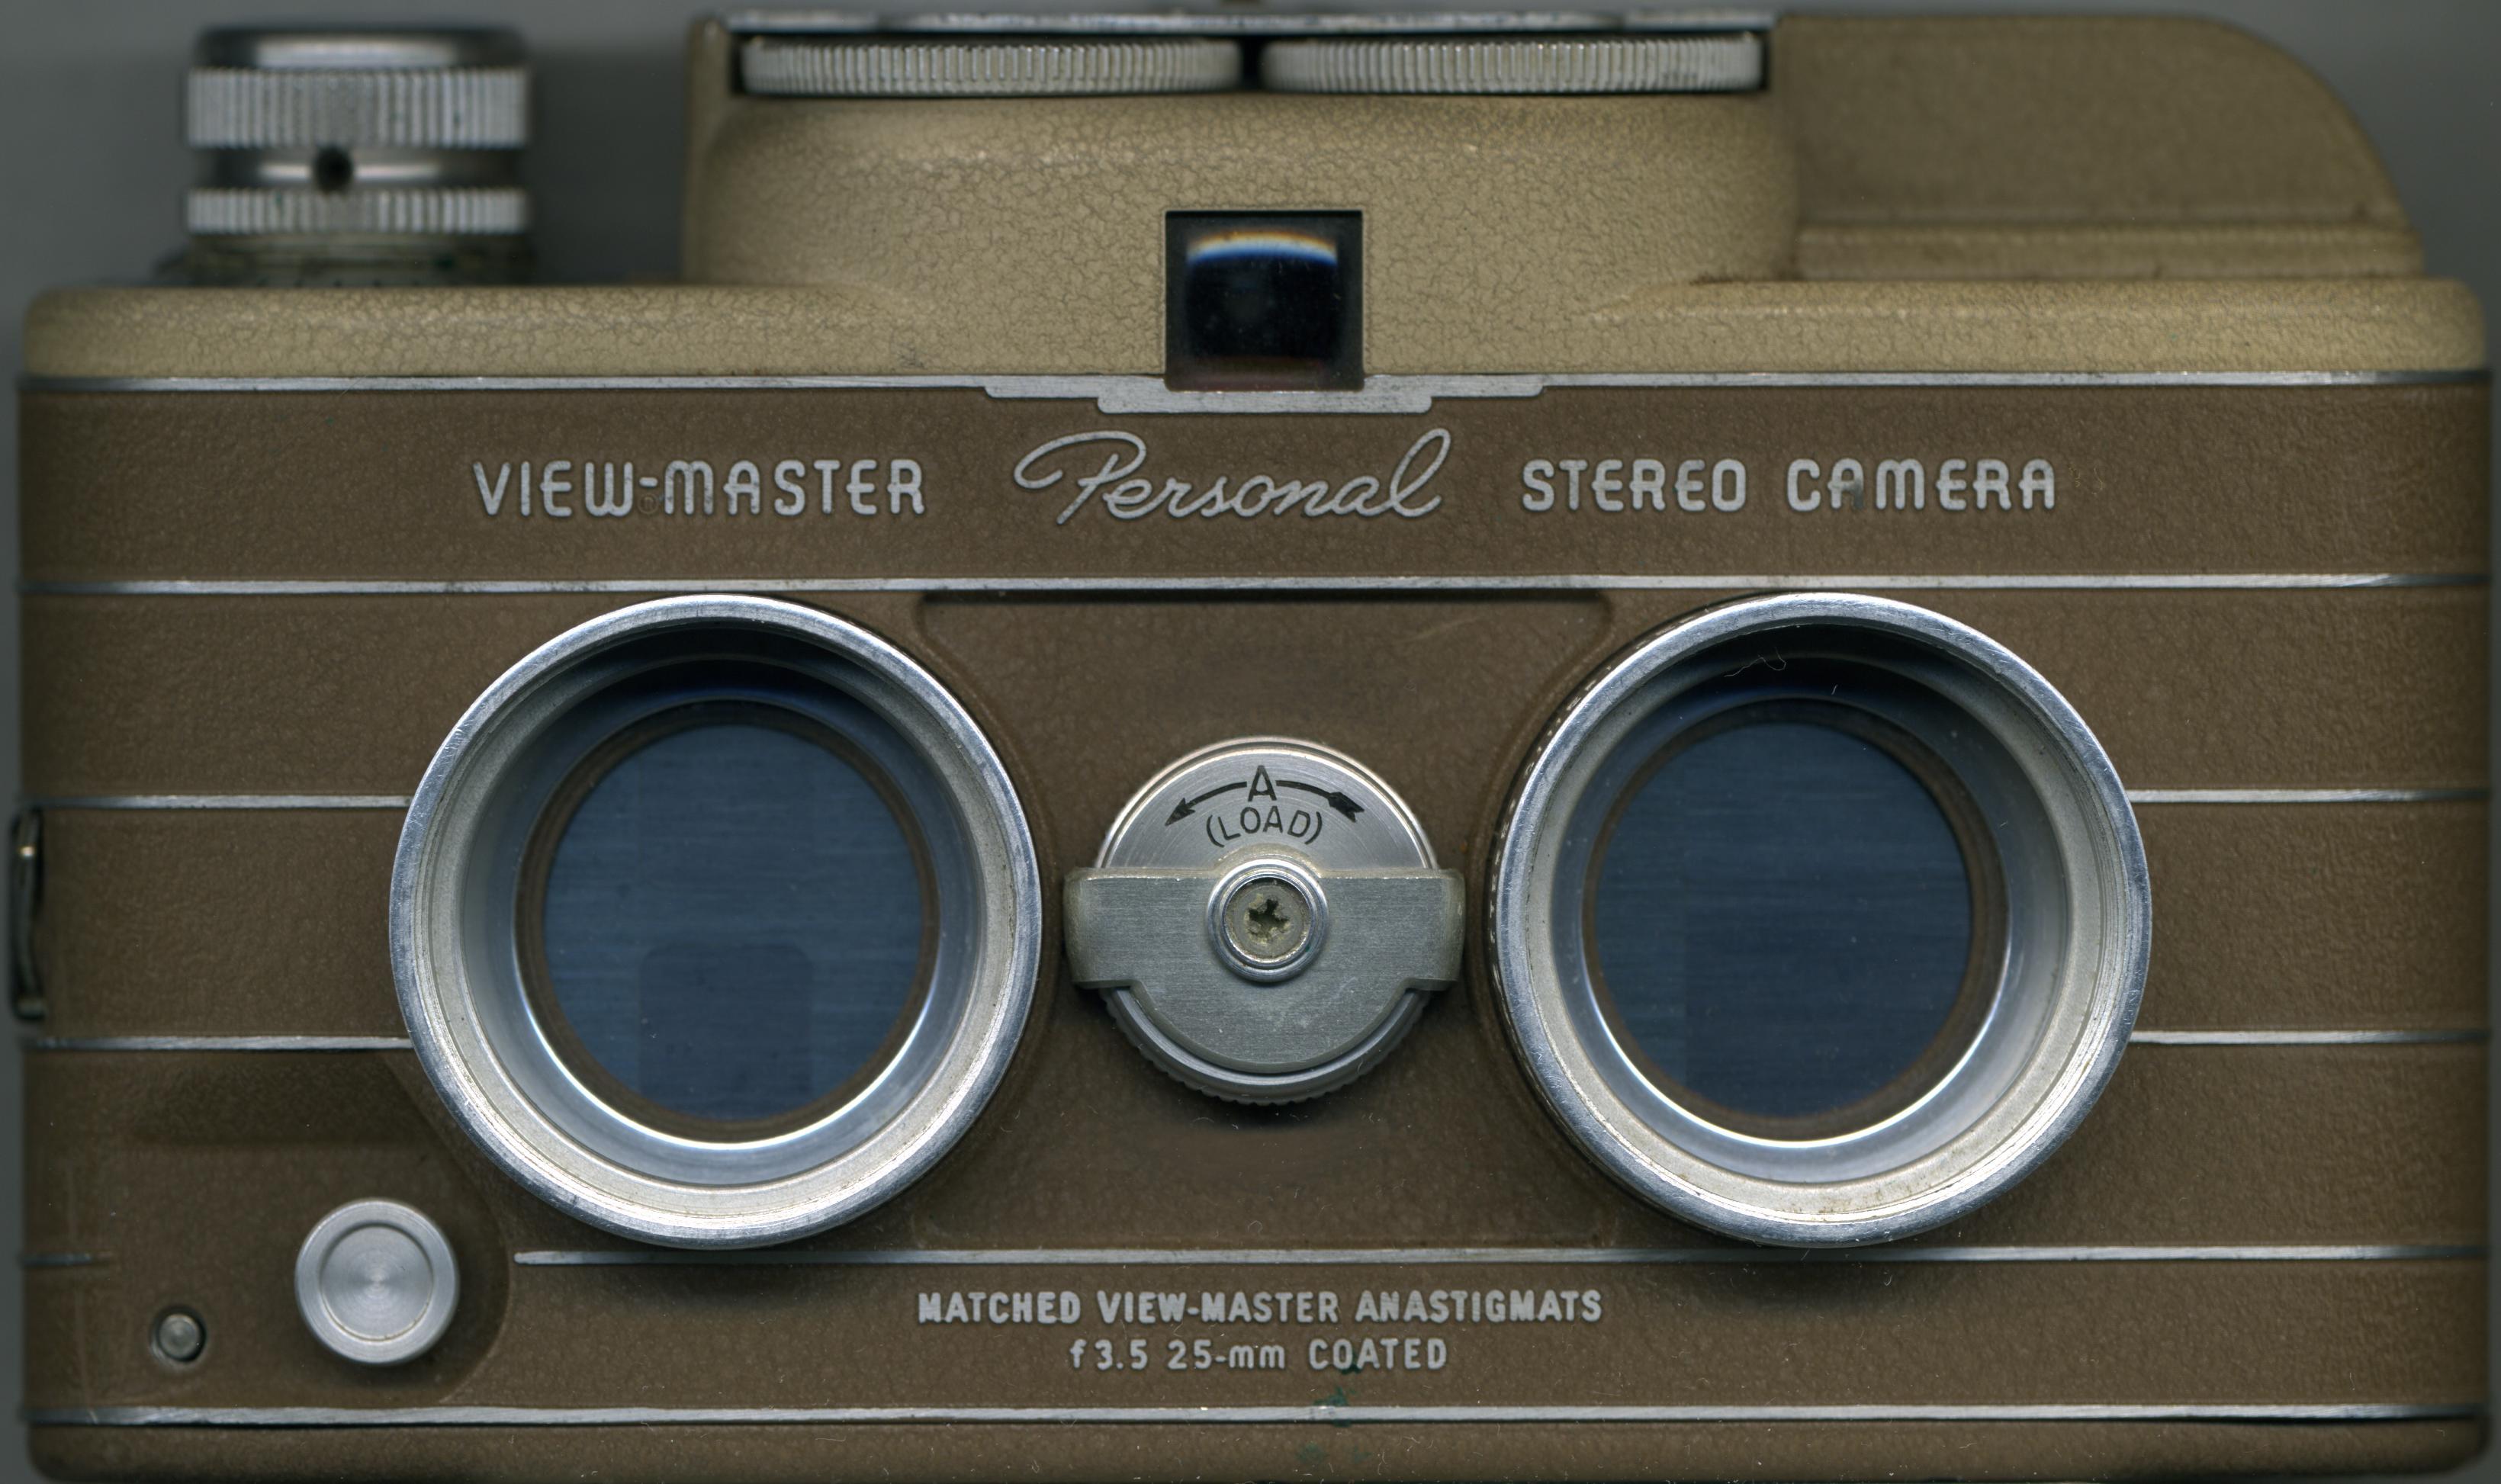 View-Master Personal Stereo Camera - Wikipedia